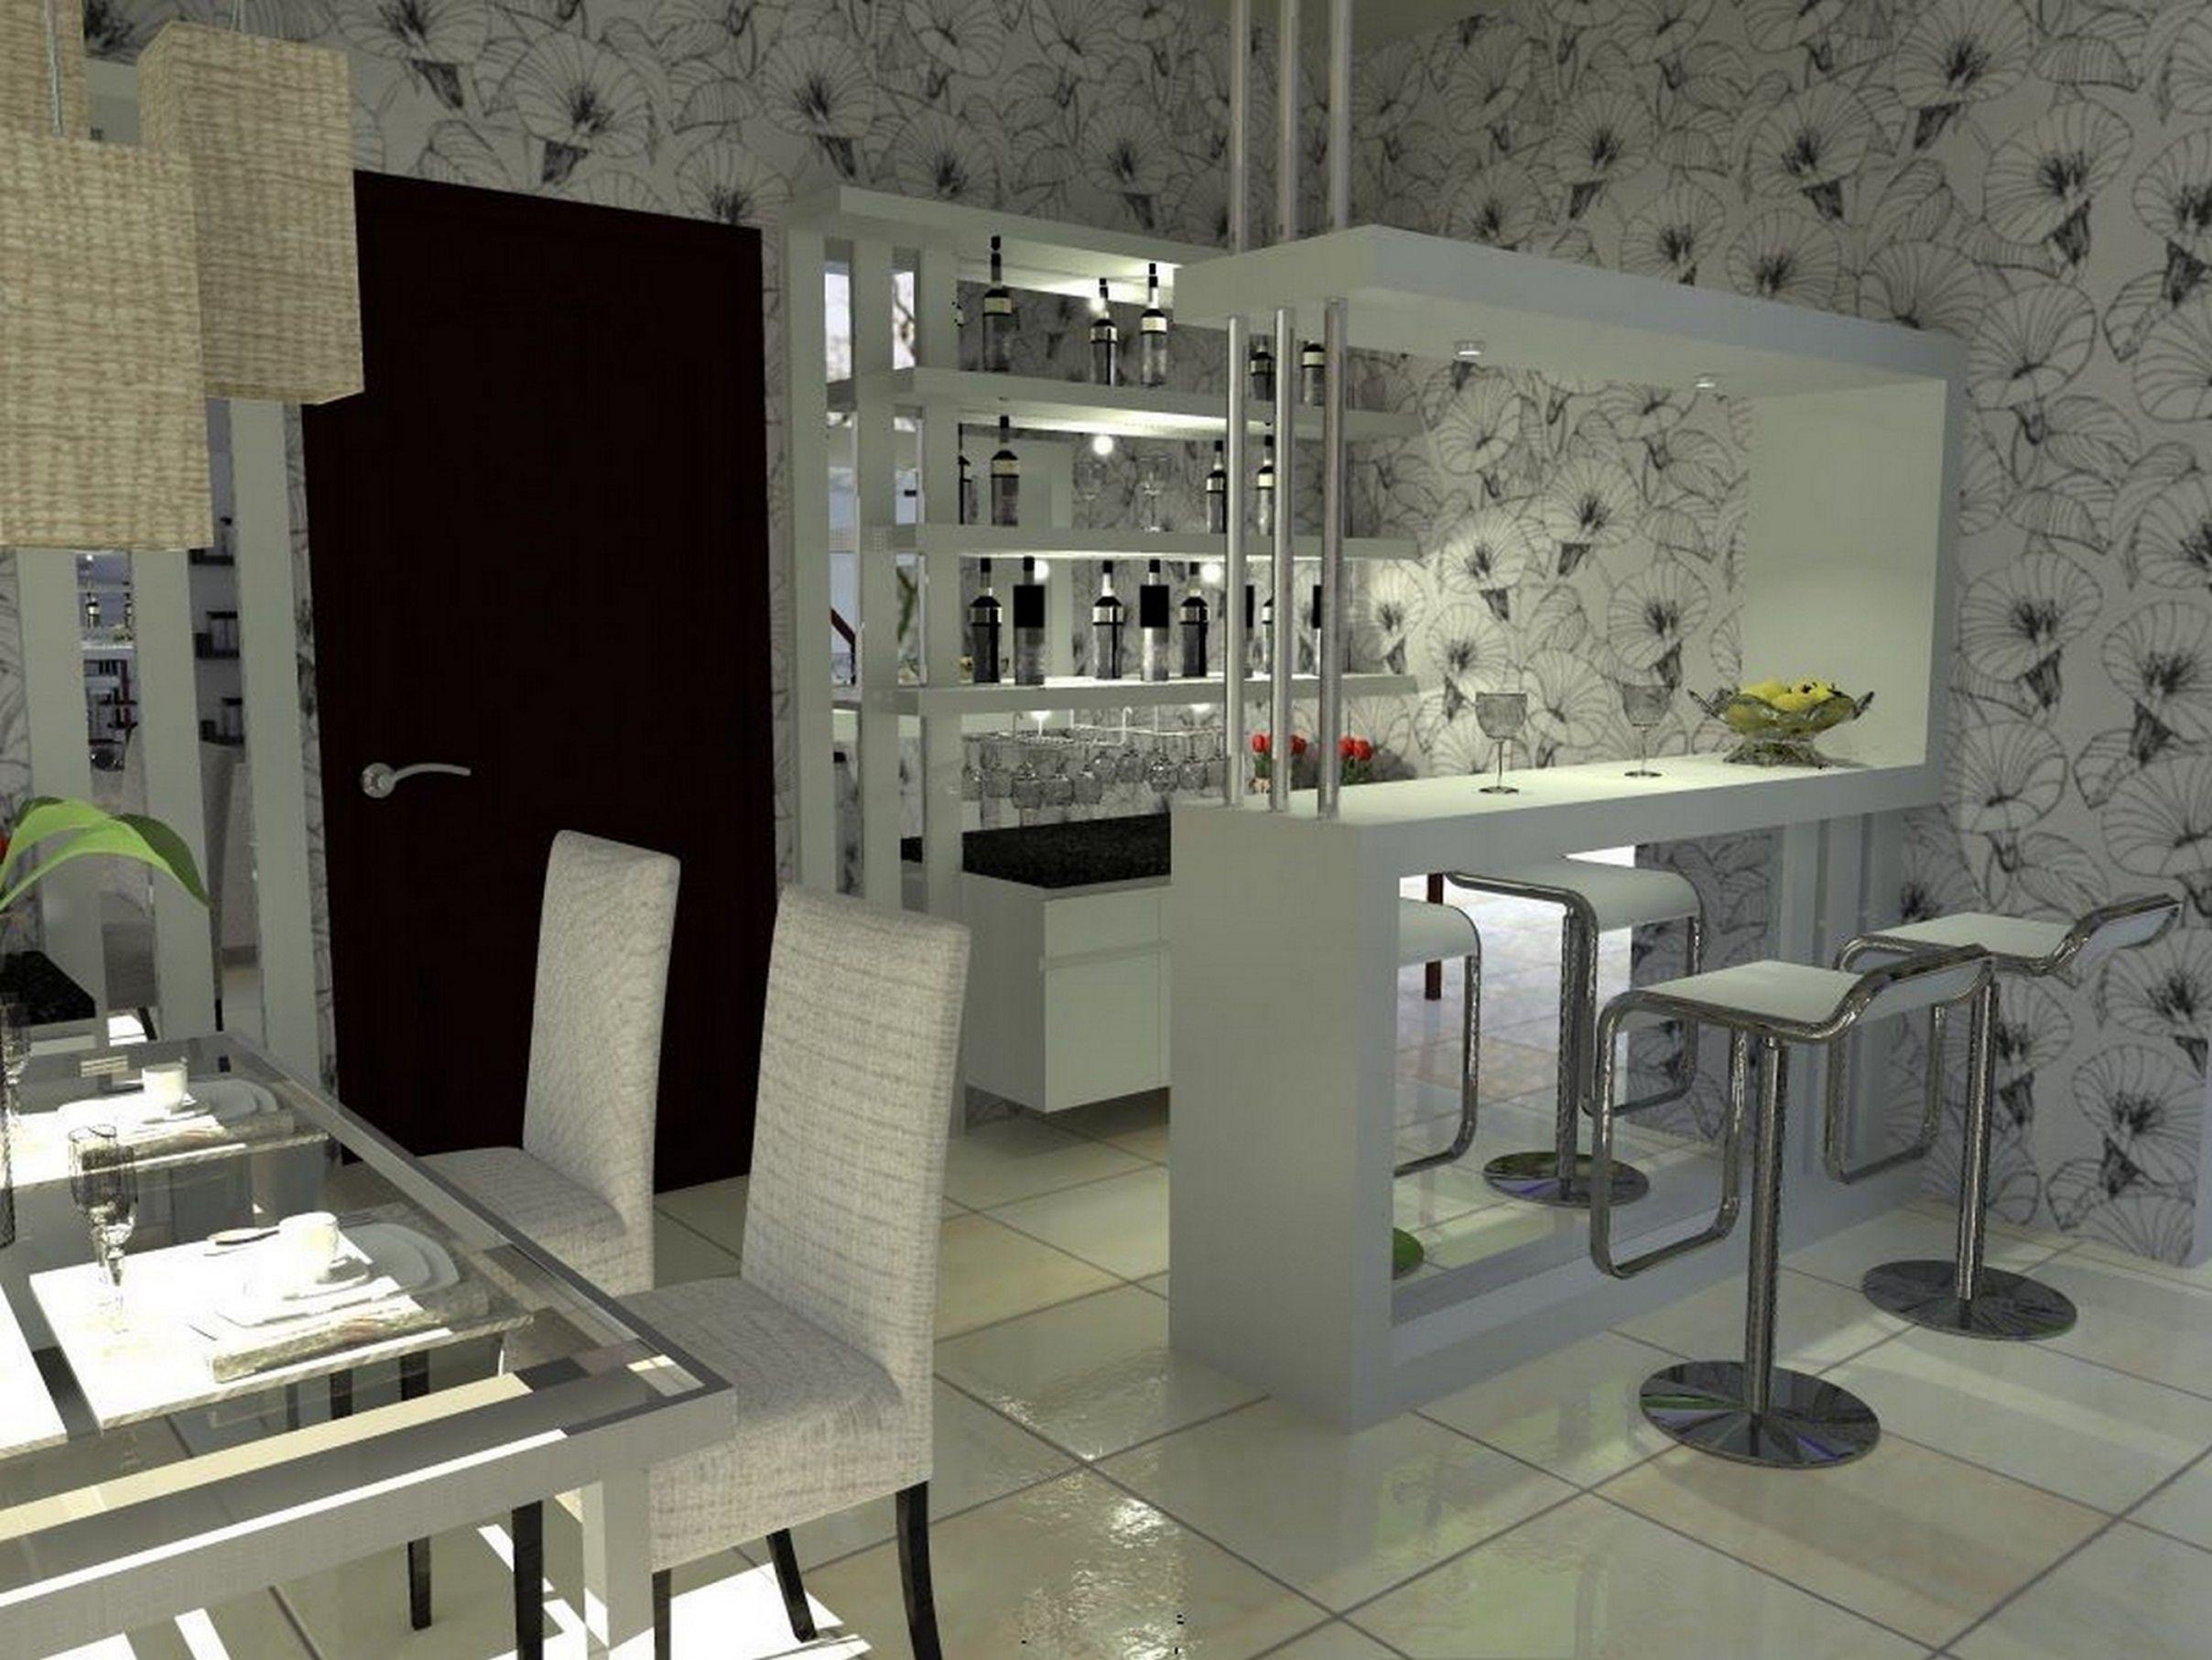 27 Fabulous Home Mini Bar Kitchen Designs For Amazing Kitchen Idea Dapur Cantik Mini Bars Dapur Modern